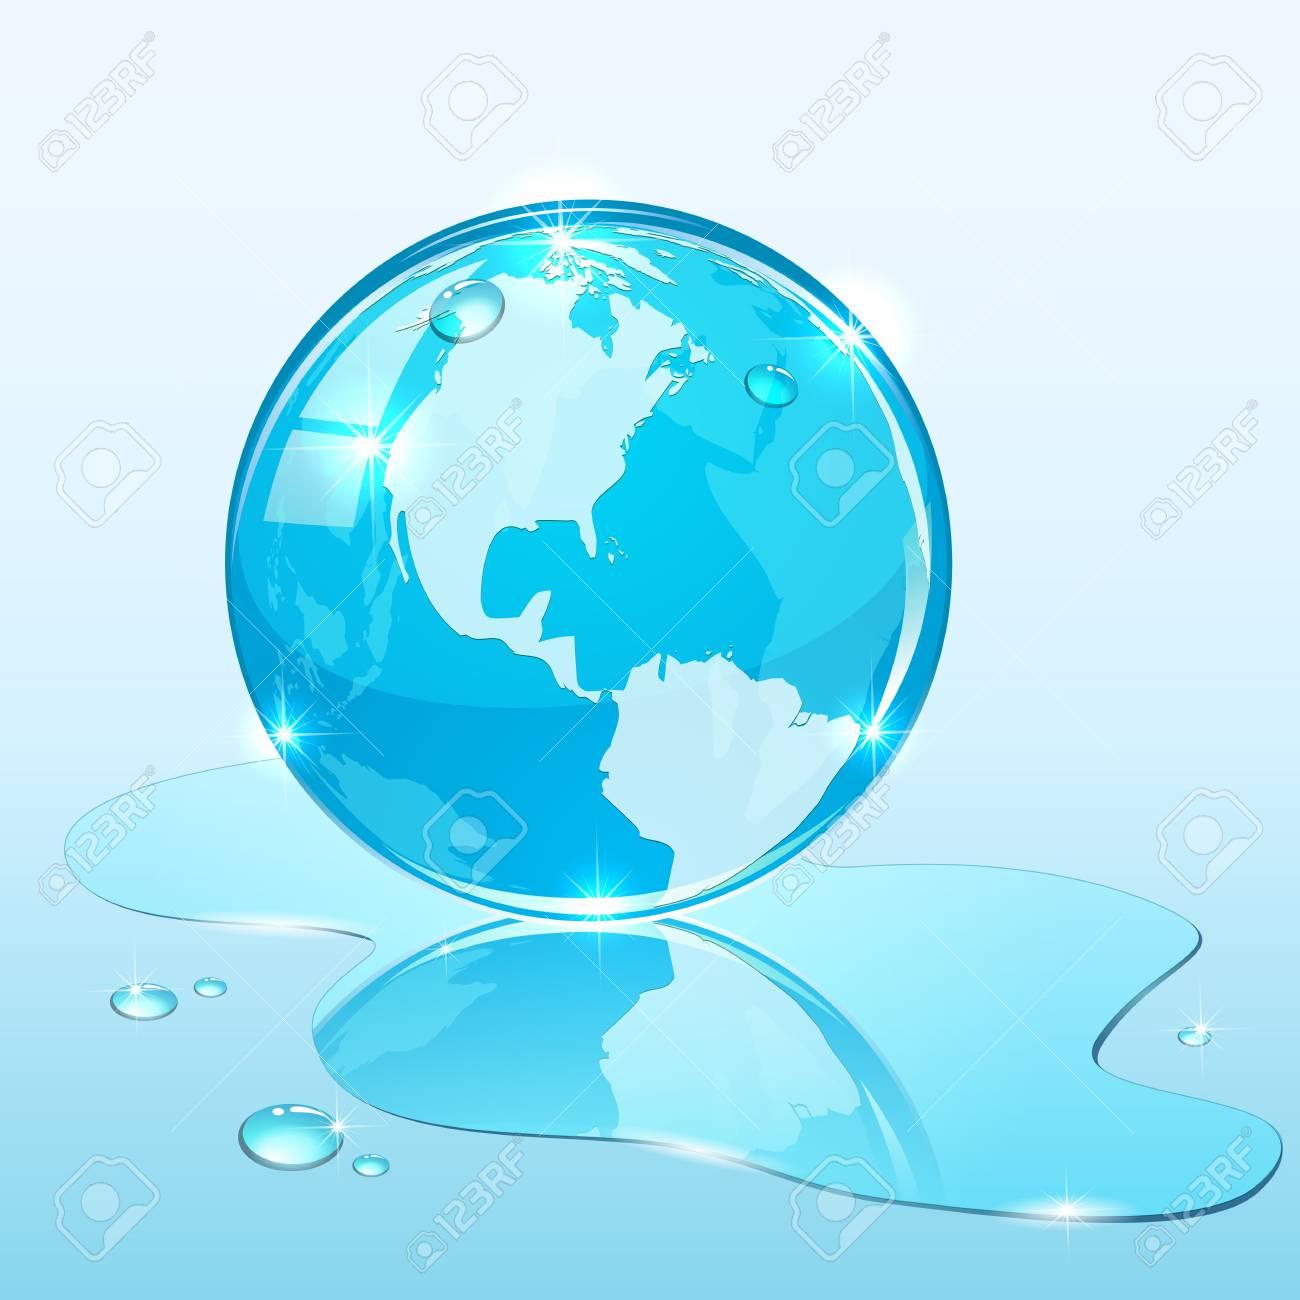 Blue shiny globe on water surface, illustration. Stock Vector - 19584979